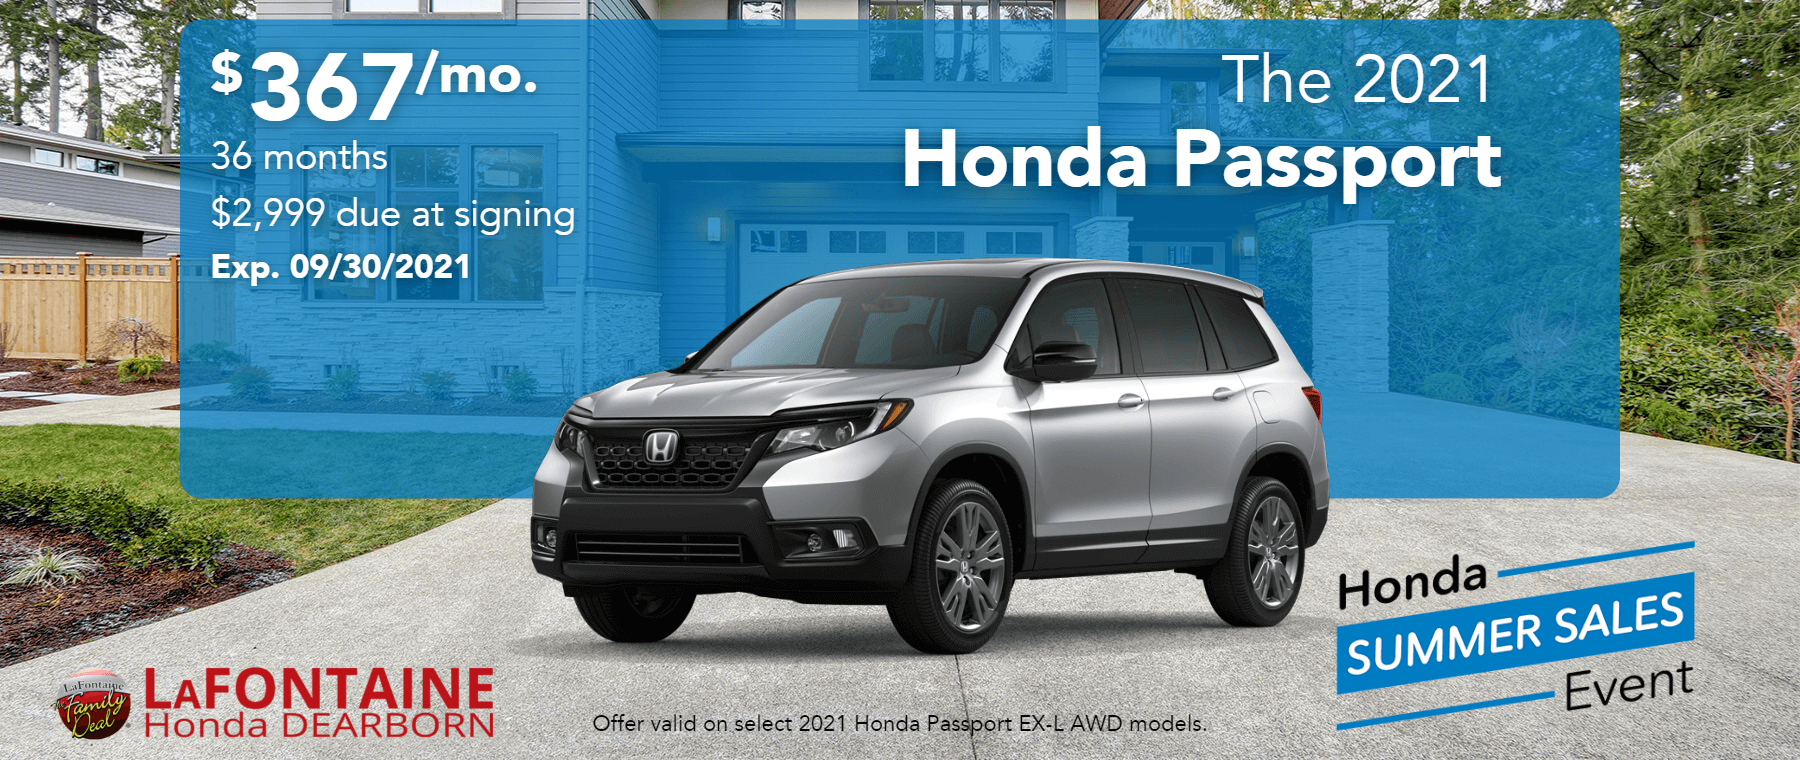 2021_Honda_Passport_EX-L AWD_Wed Sep 08 2021 14_20_23 GMT-0400 (Eastern Daylight Time)